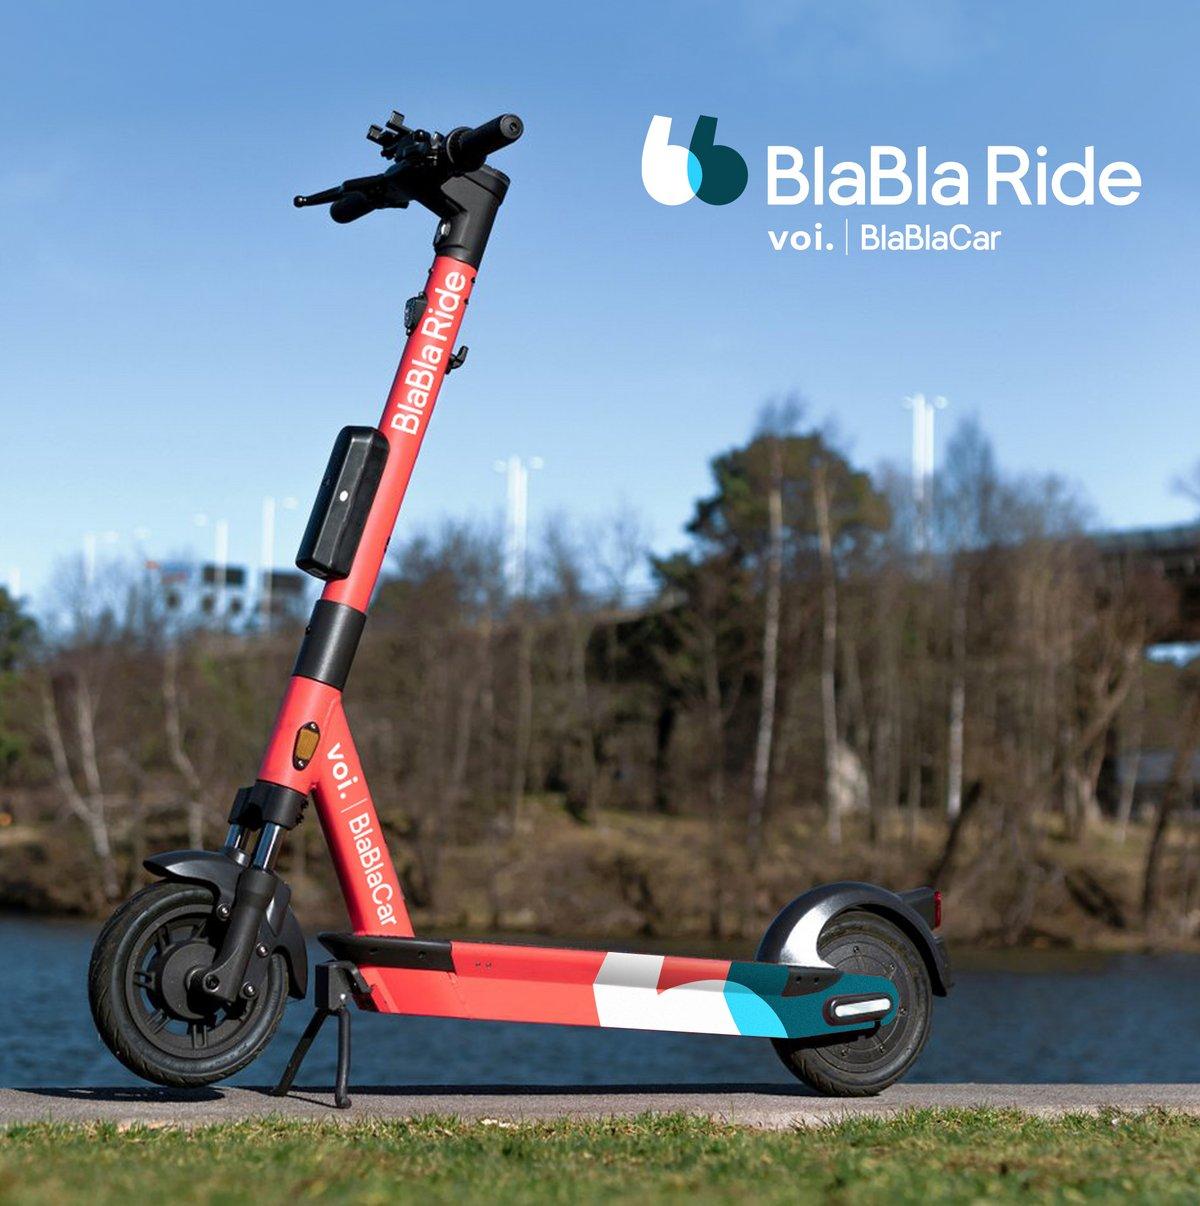 BlaBla Ride